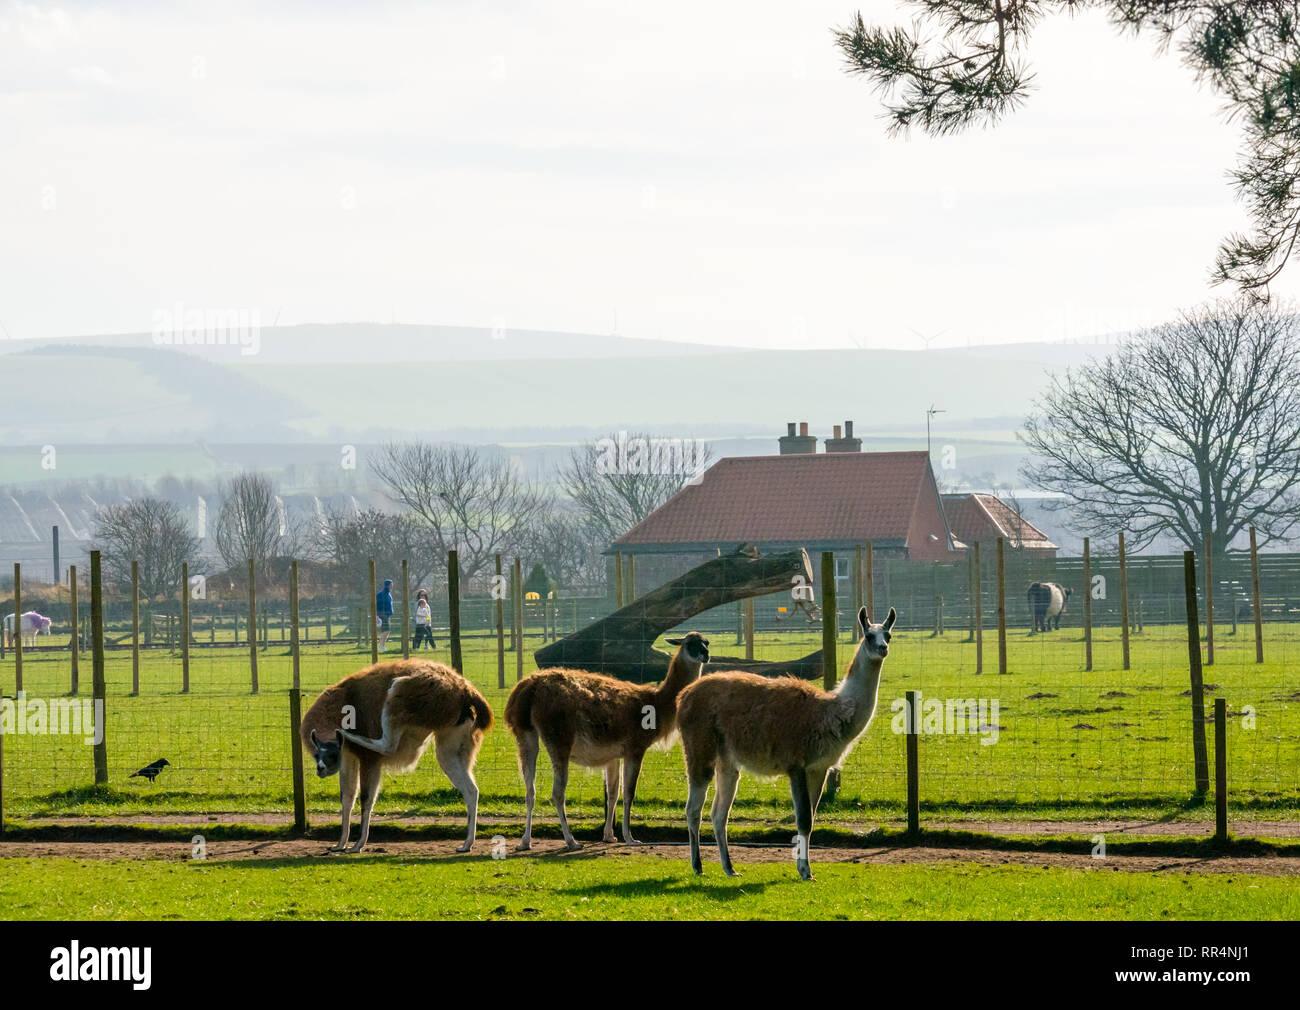 John Muir Country Park, Dunbar, East Lothian, Scotland, United Kingdom, 24th February 2019. Llamas at East Links Family Park on an unusually warm sunny Winter day - Stock Image